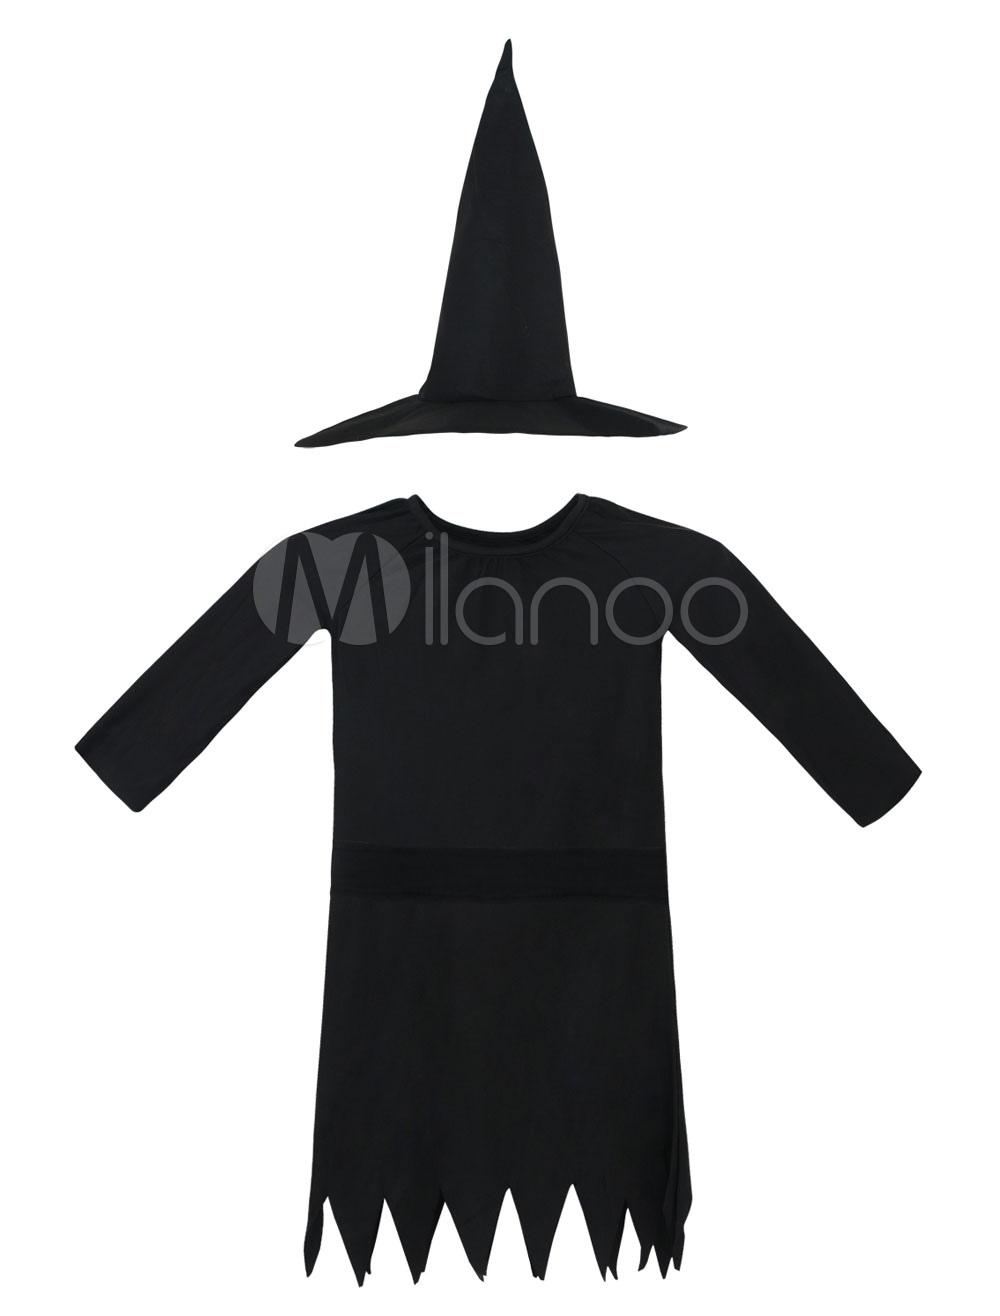 Witchy Witch Black Costume Dress Adult M L XL NIP